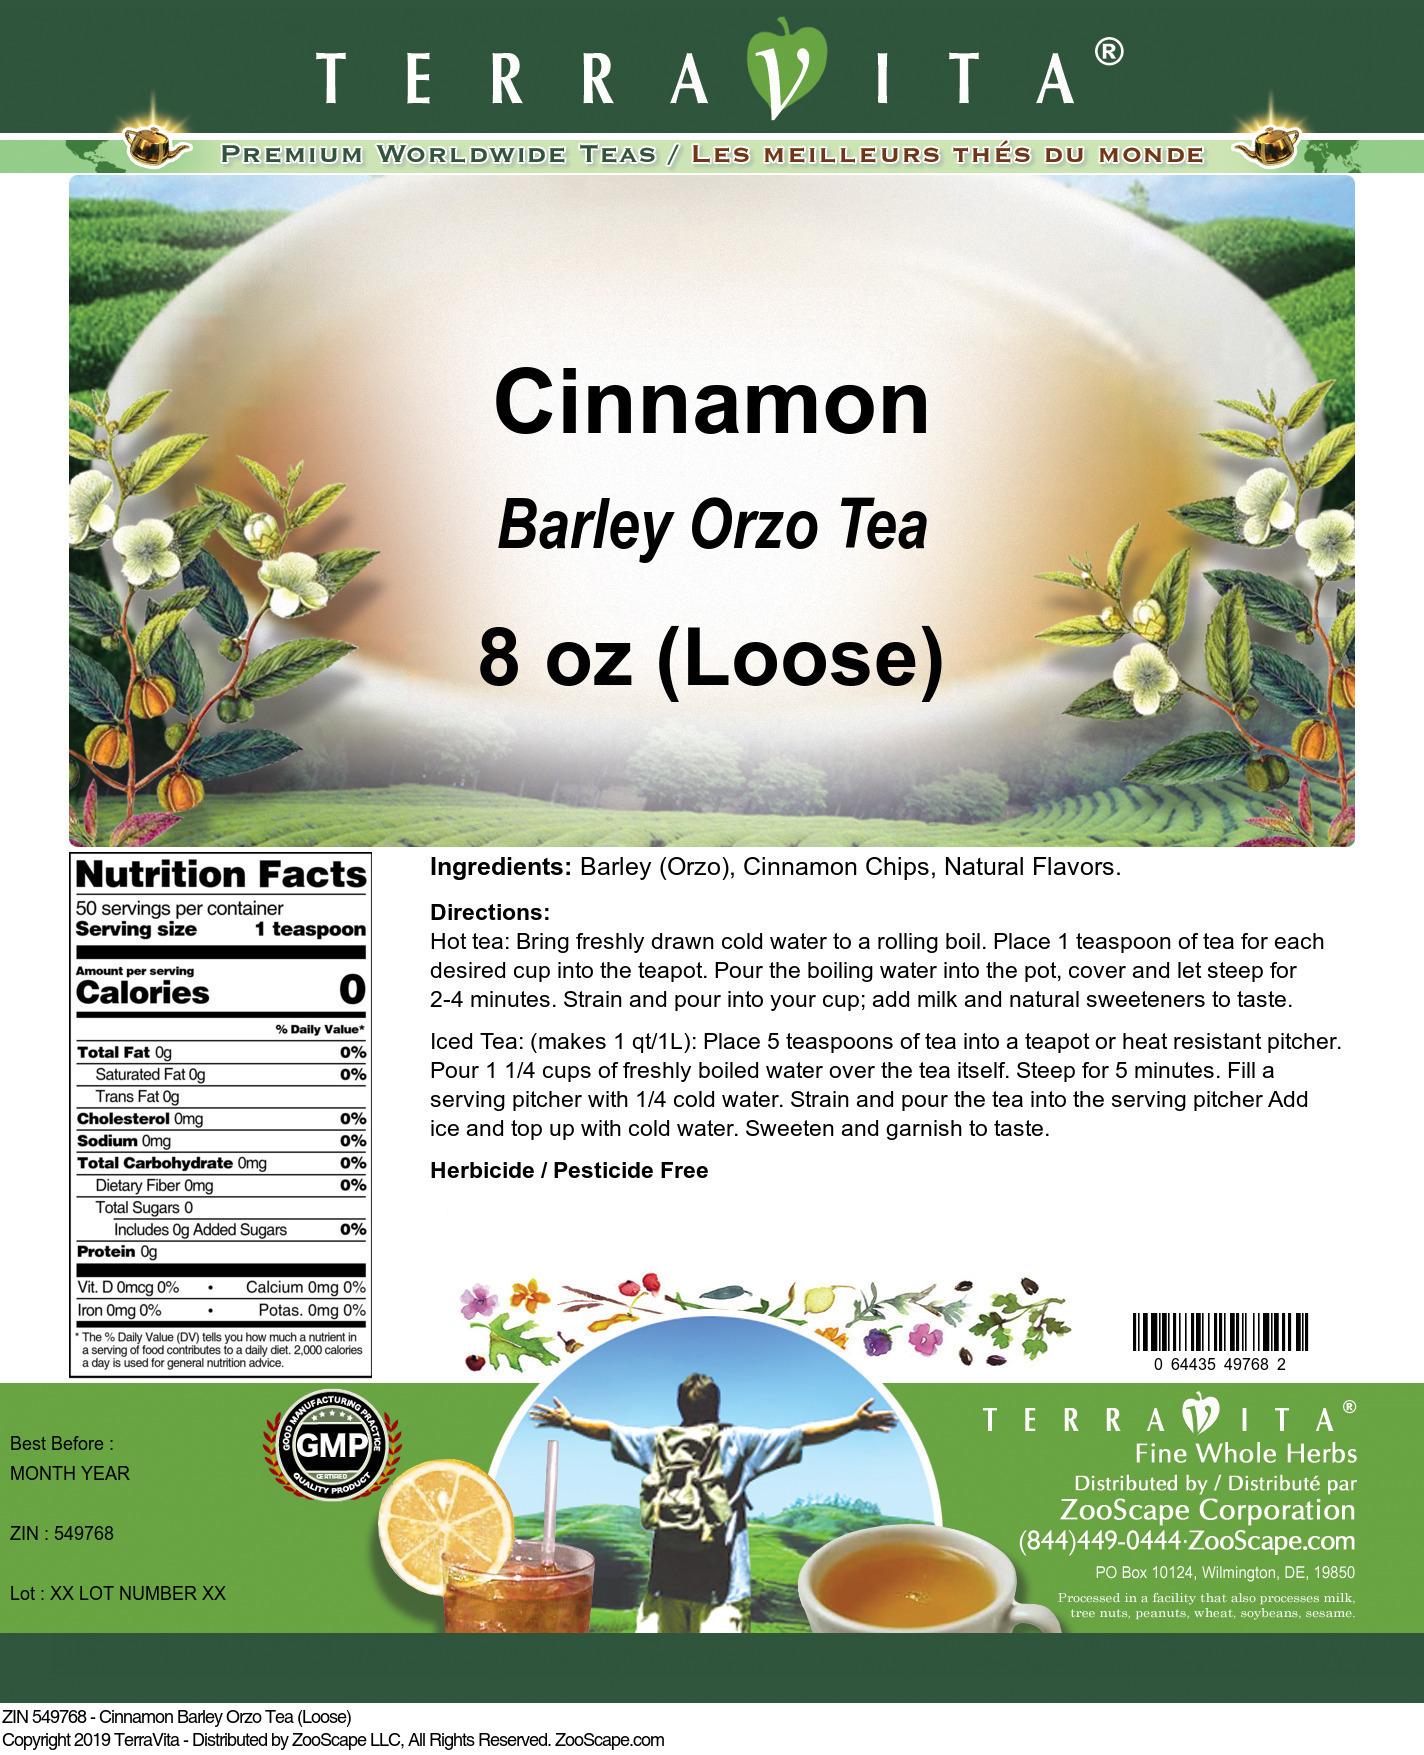 Cinnamon Barley Orzo